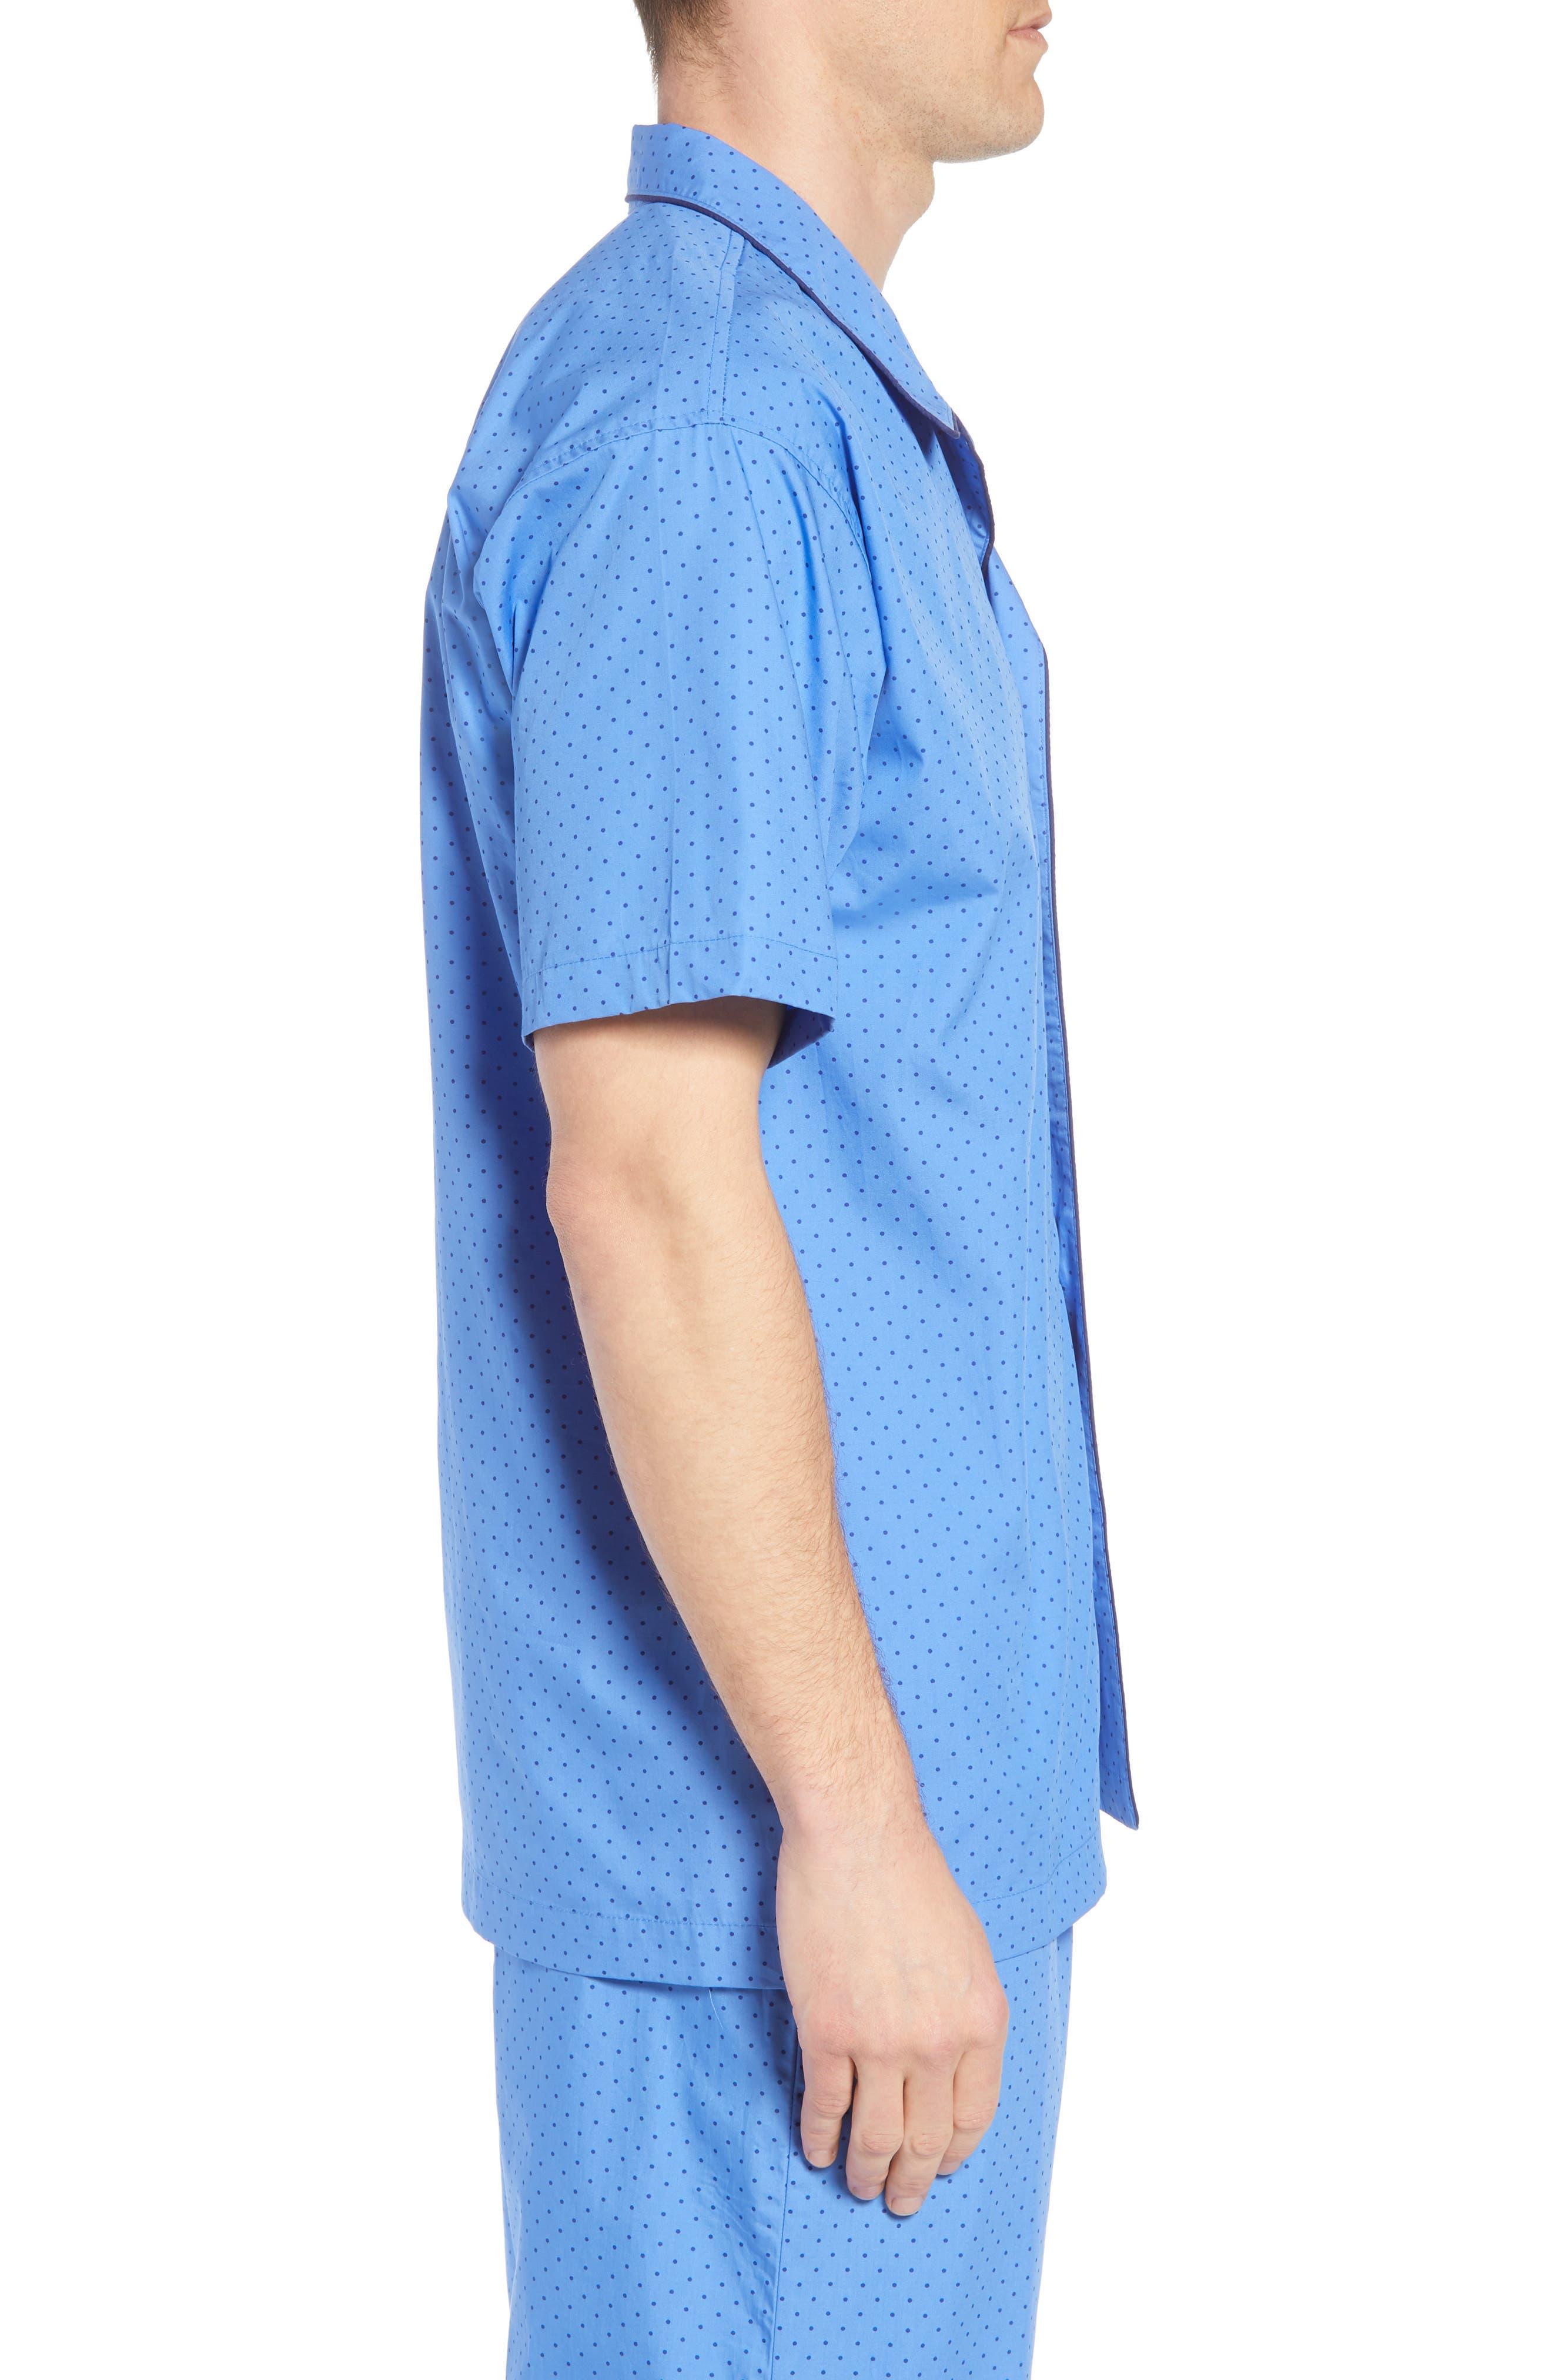 POLO RALPH LAUREN,                             Dot Cotton Pajama Shirt,                             Alternate thumbnail 3, color,                             451